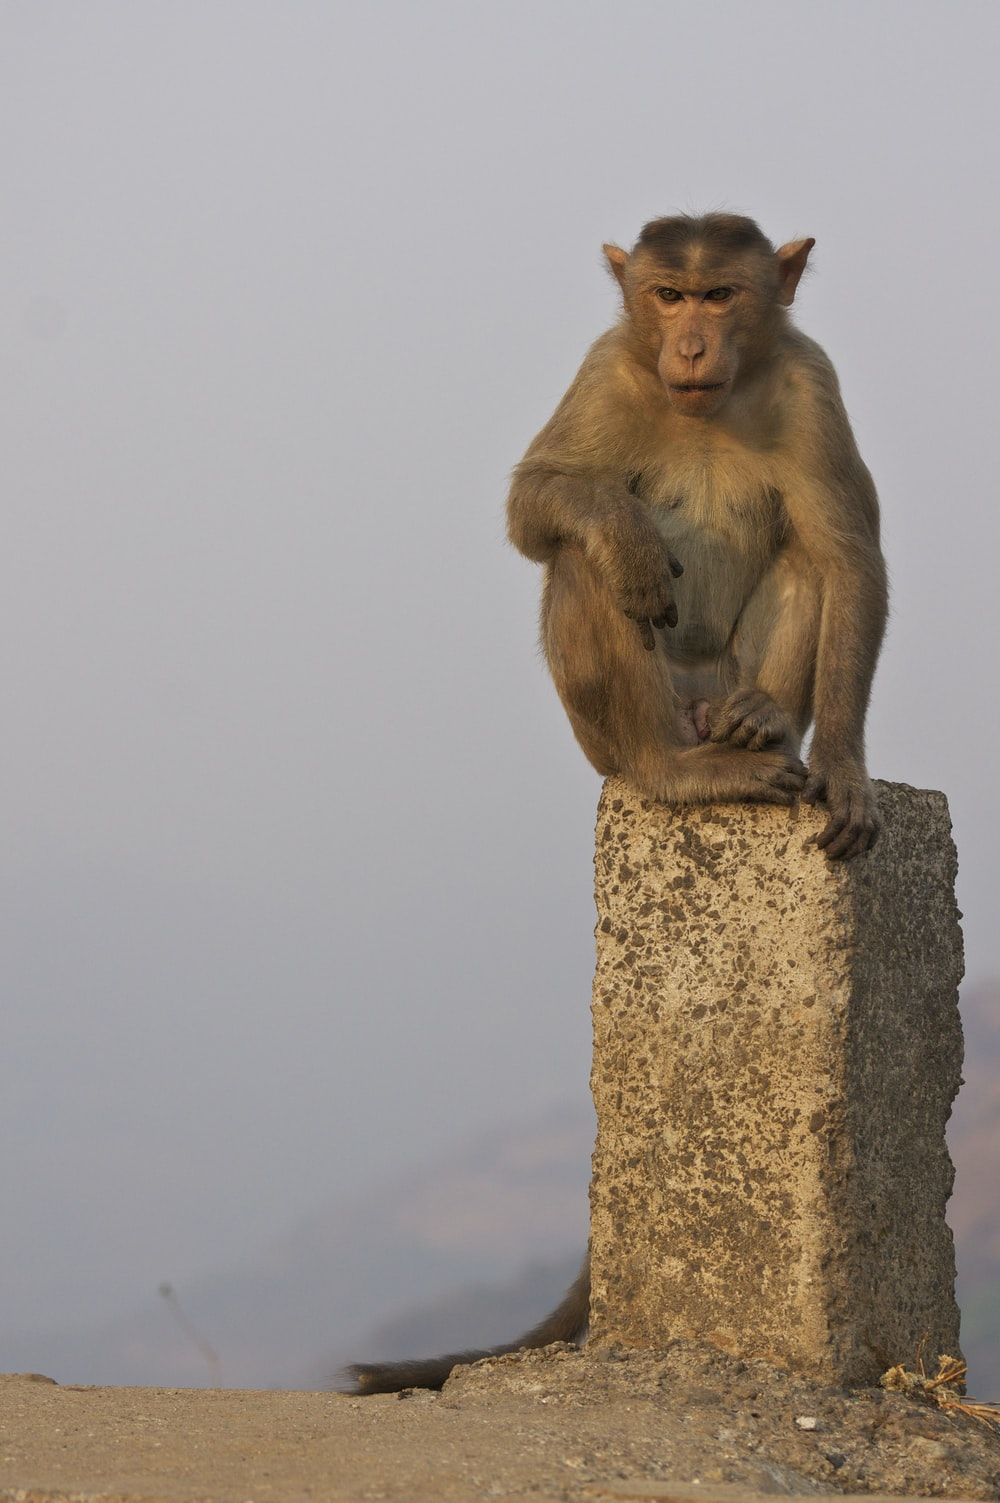 monkey sitting on stone